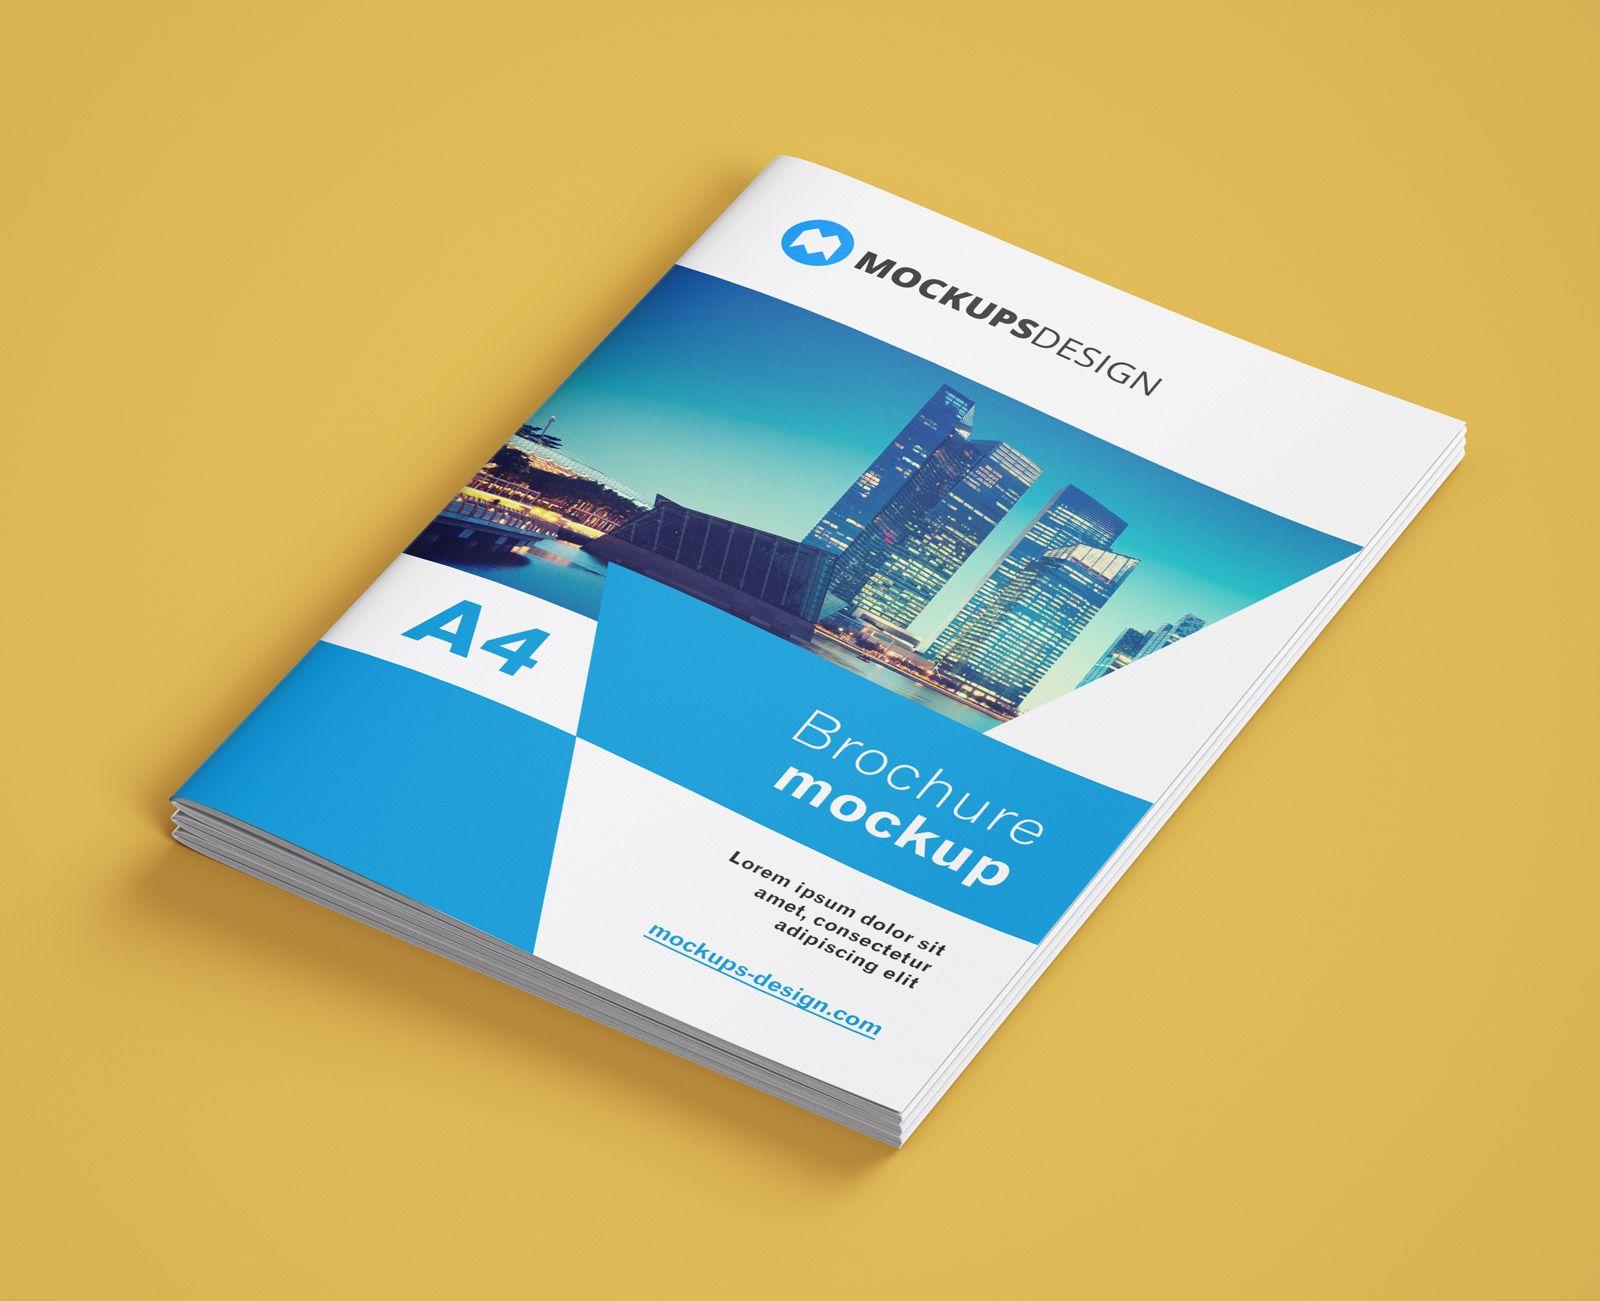 Free A4 Brochure Company Profile Mockup Psd 1 Company Profile Brochure Company Profile Presentation